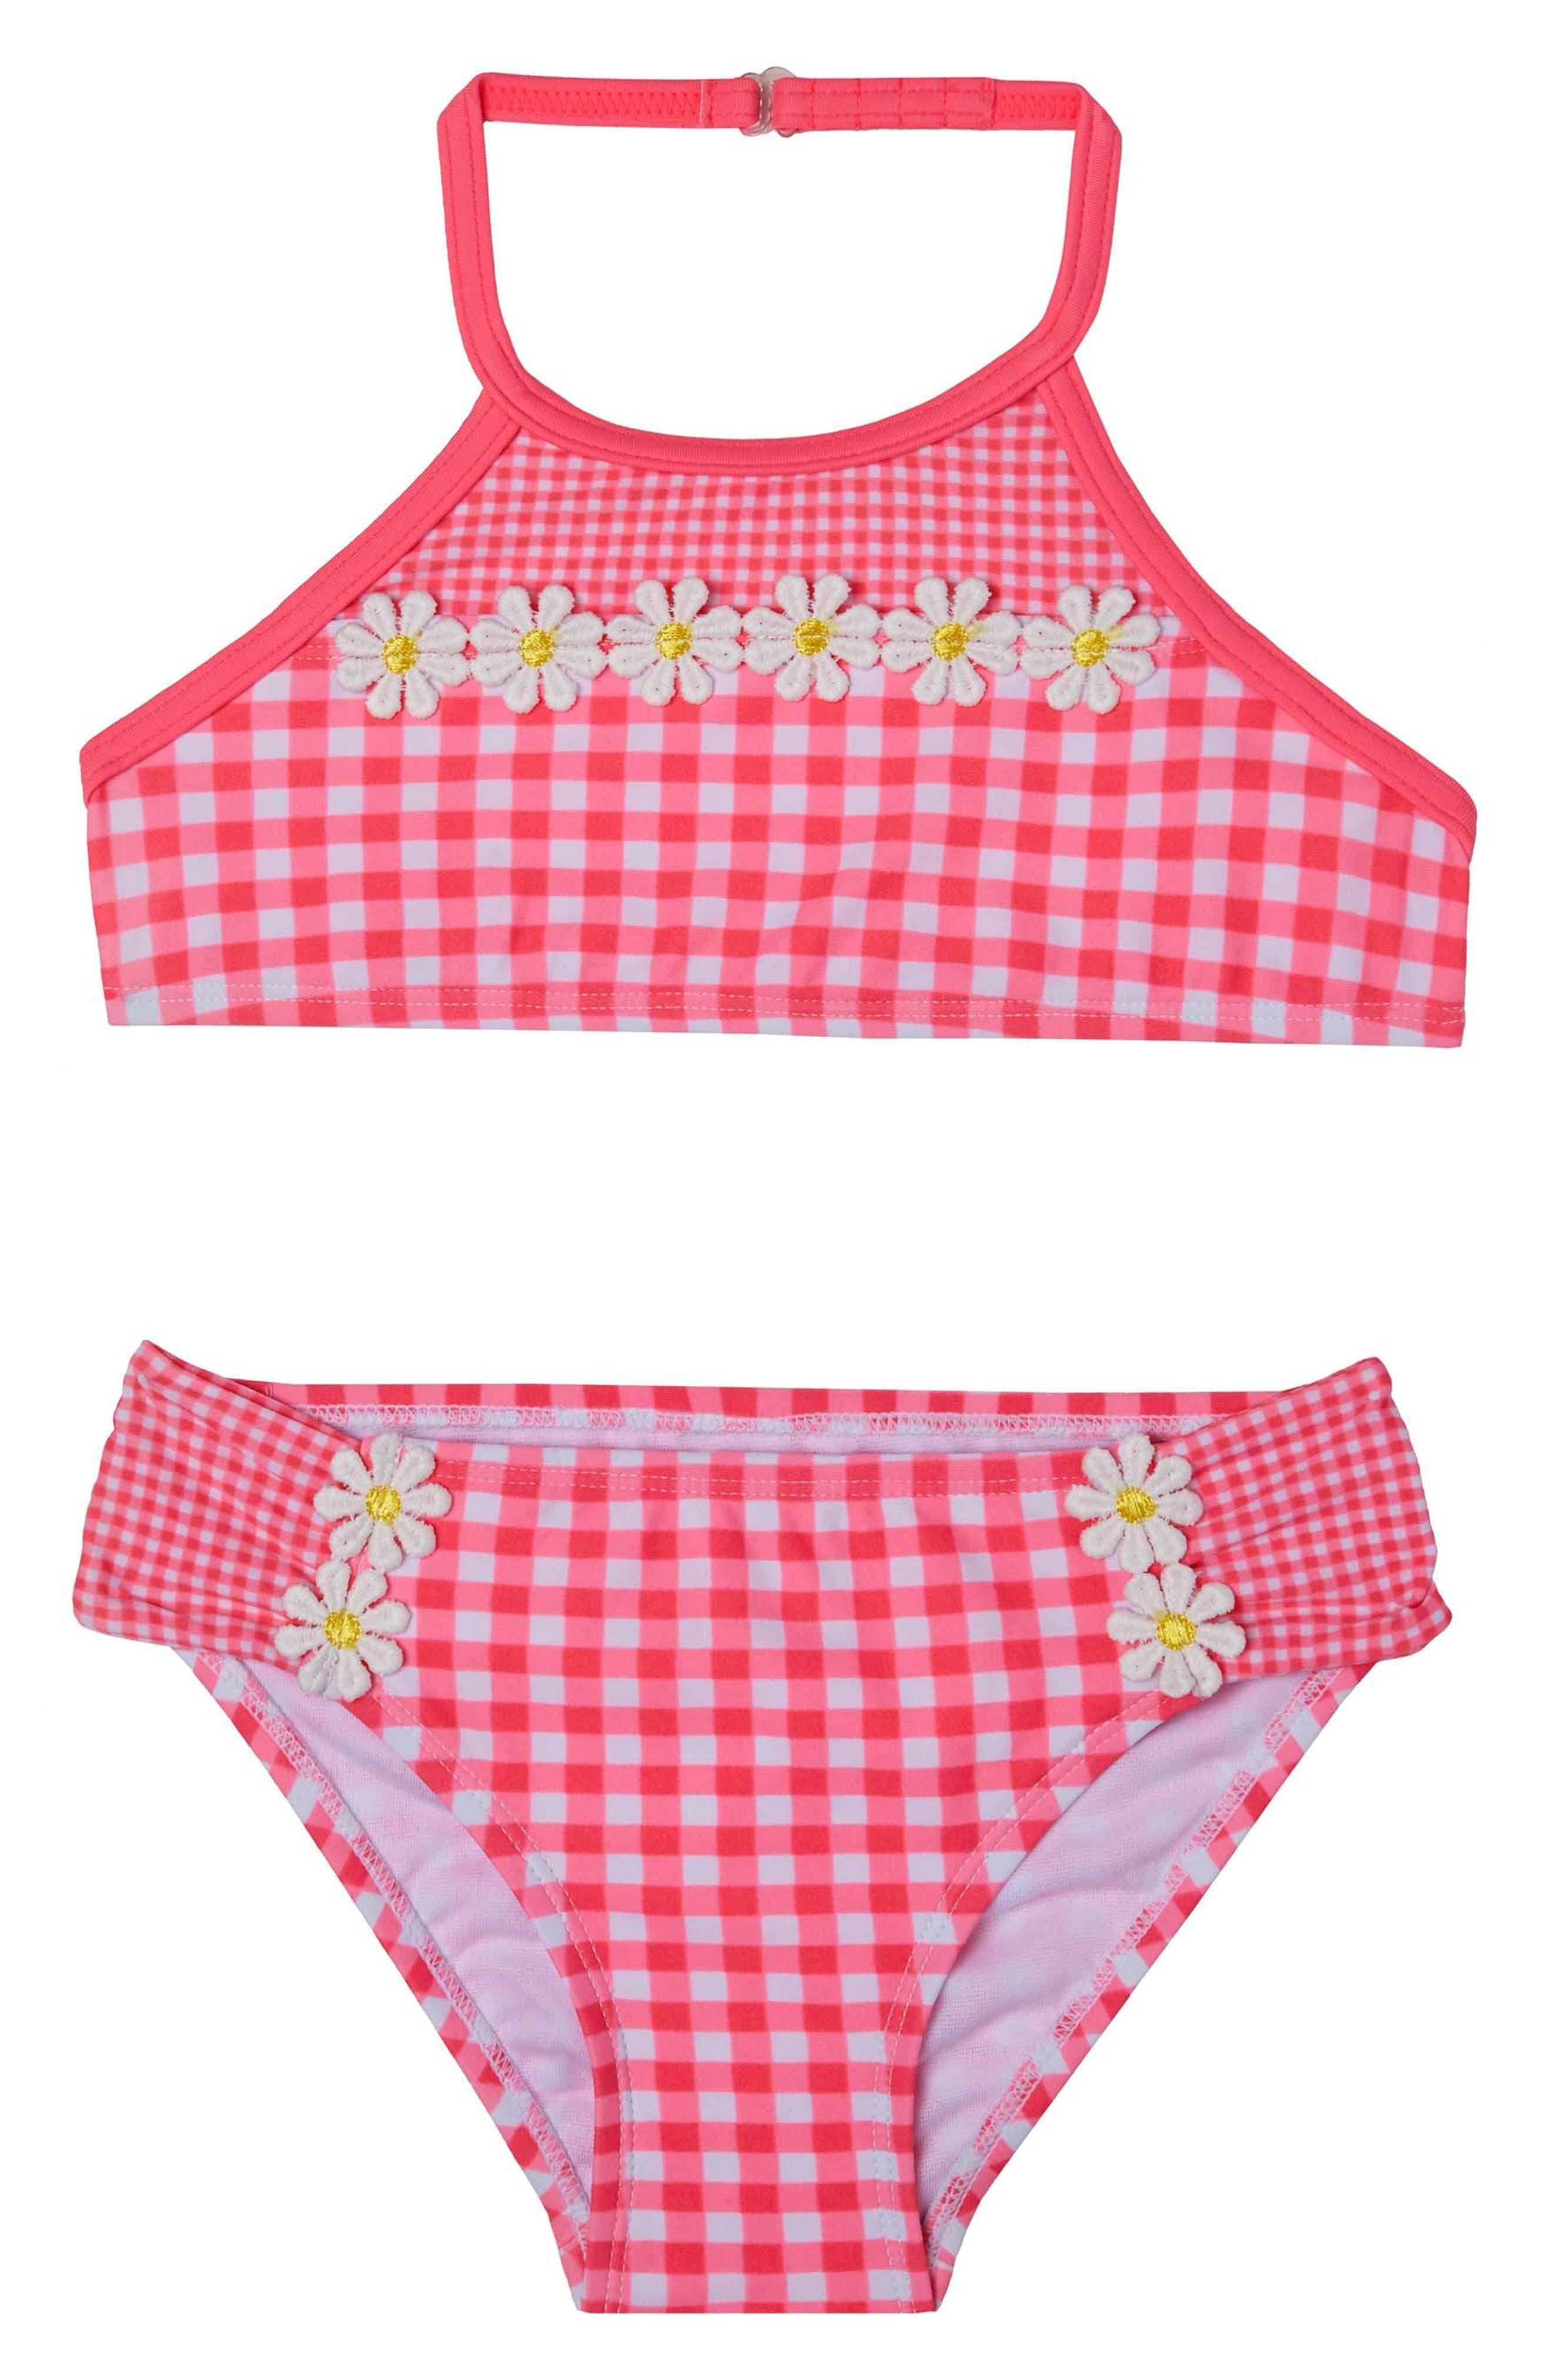 Main Image - Hula Star Picnic Gingham Two-Piece Swimsuit (Toddler Girls & Little Girls)